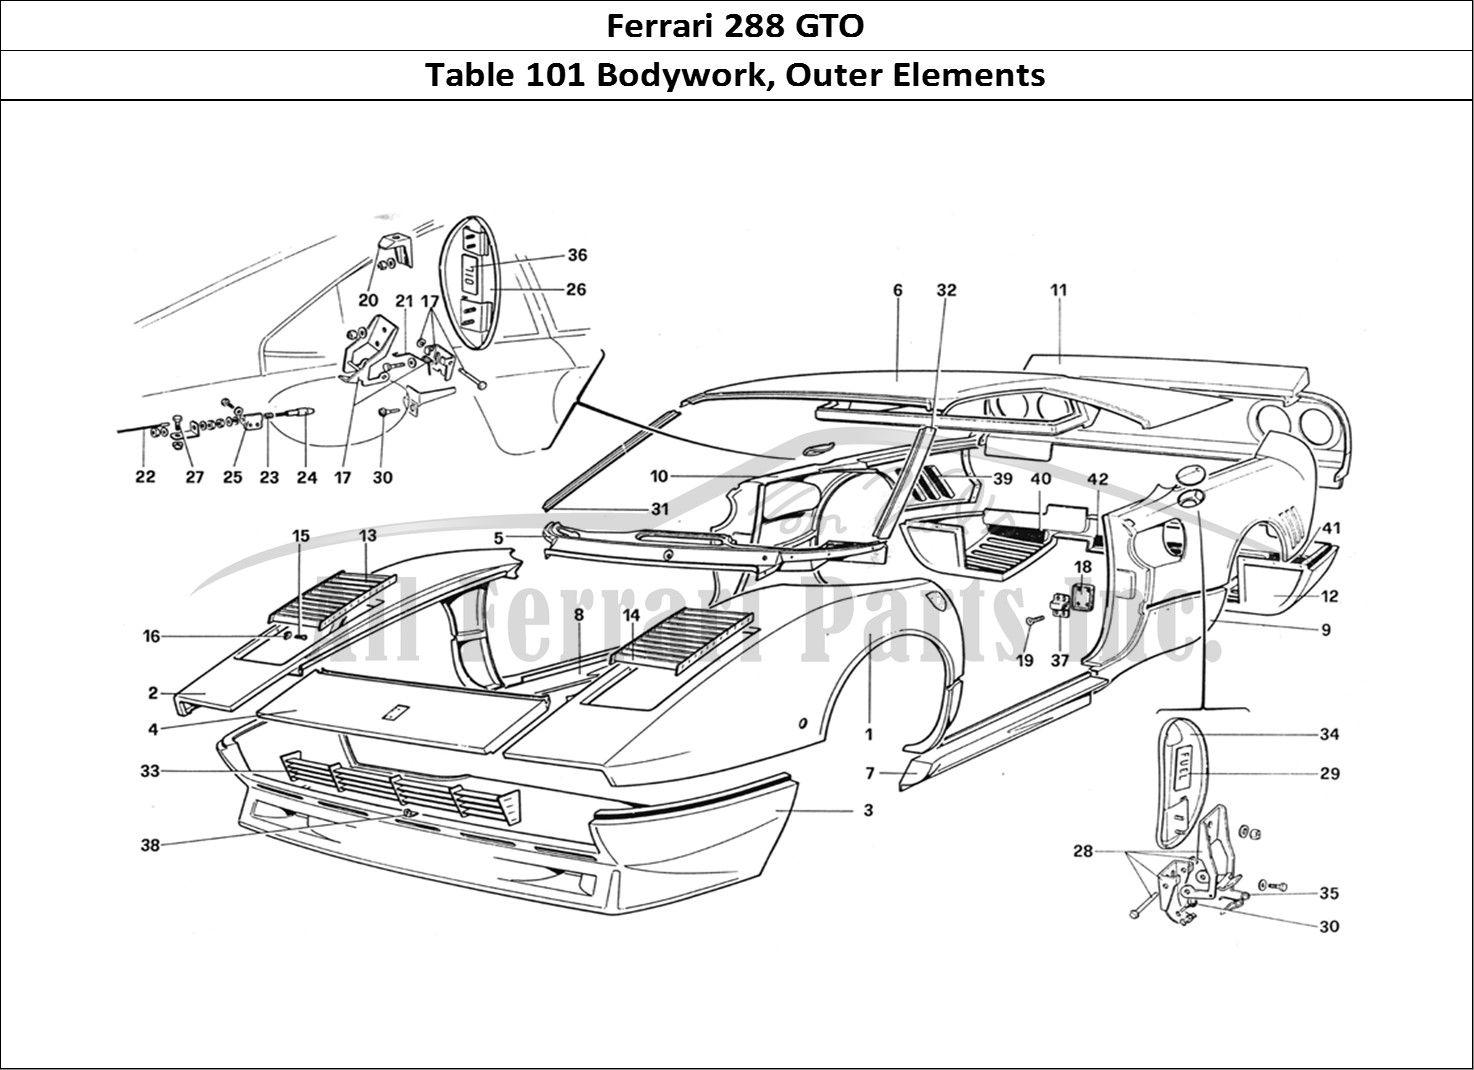 Ferrari 288 Gto Bodywork Table 101 Bodywork Outer Elements Ferrari 288 Gto Gto Bodywork